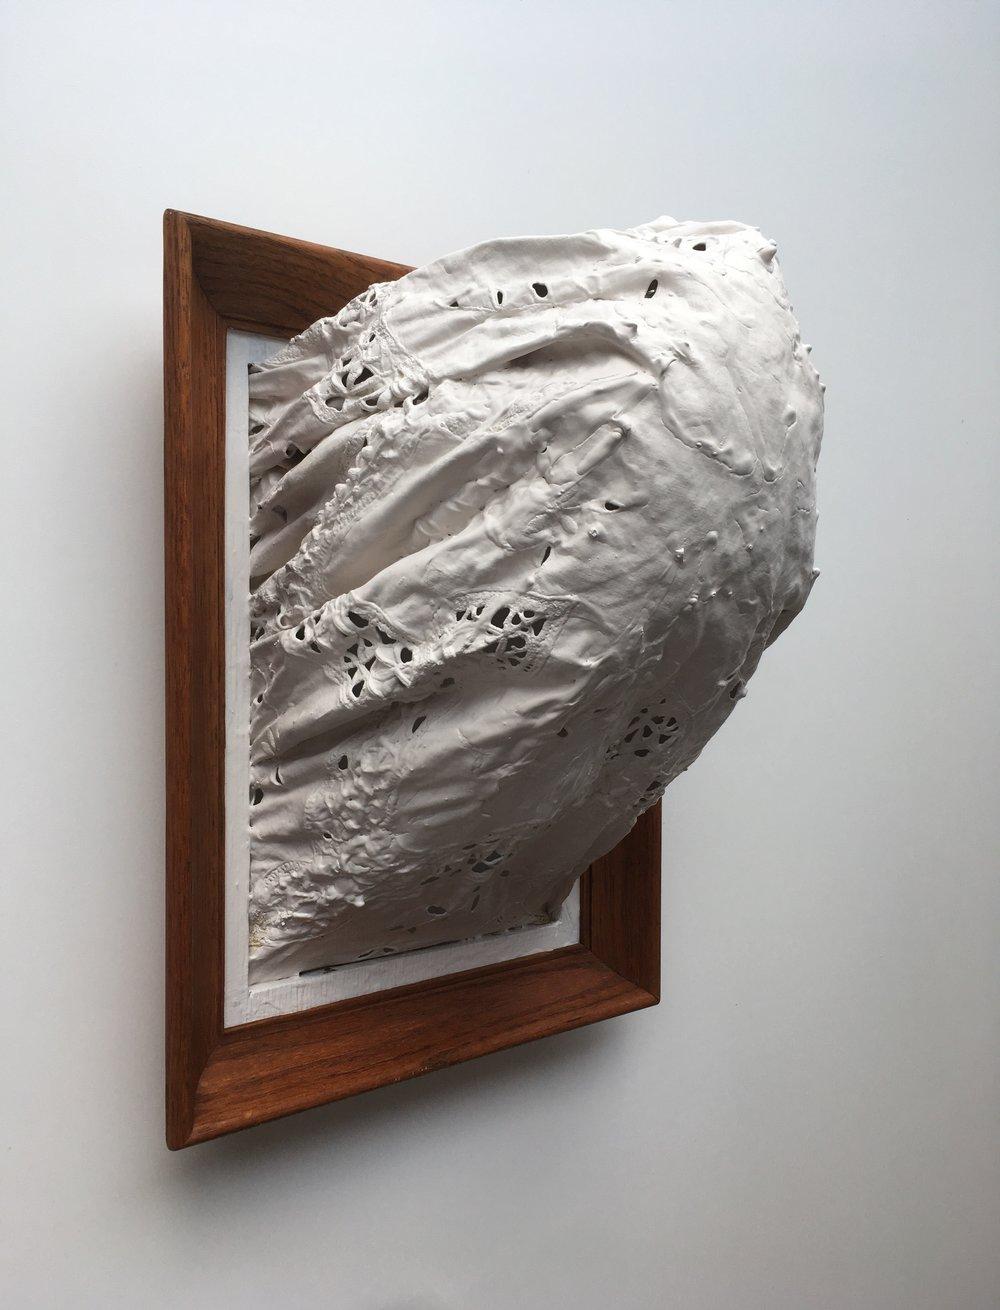 "Kevin Donegan, Thrust, 2019, Found Objects, Latex, 17x13x10"""